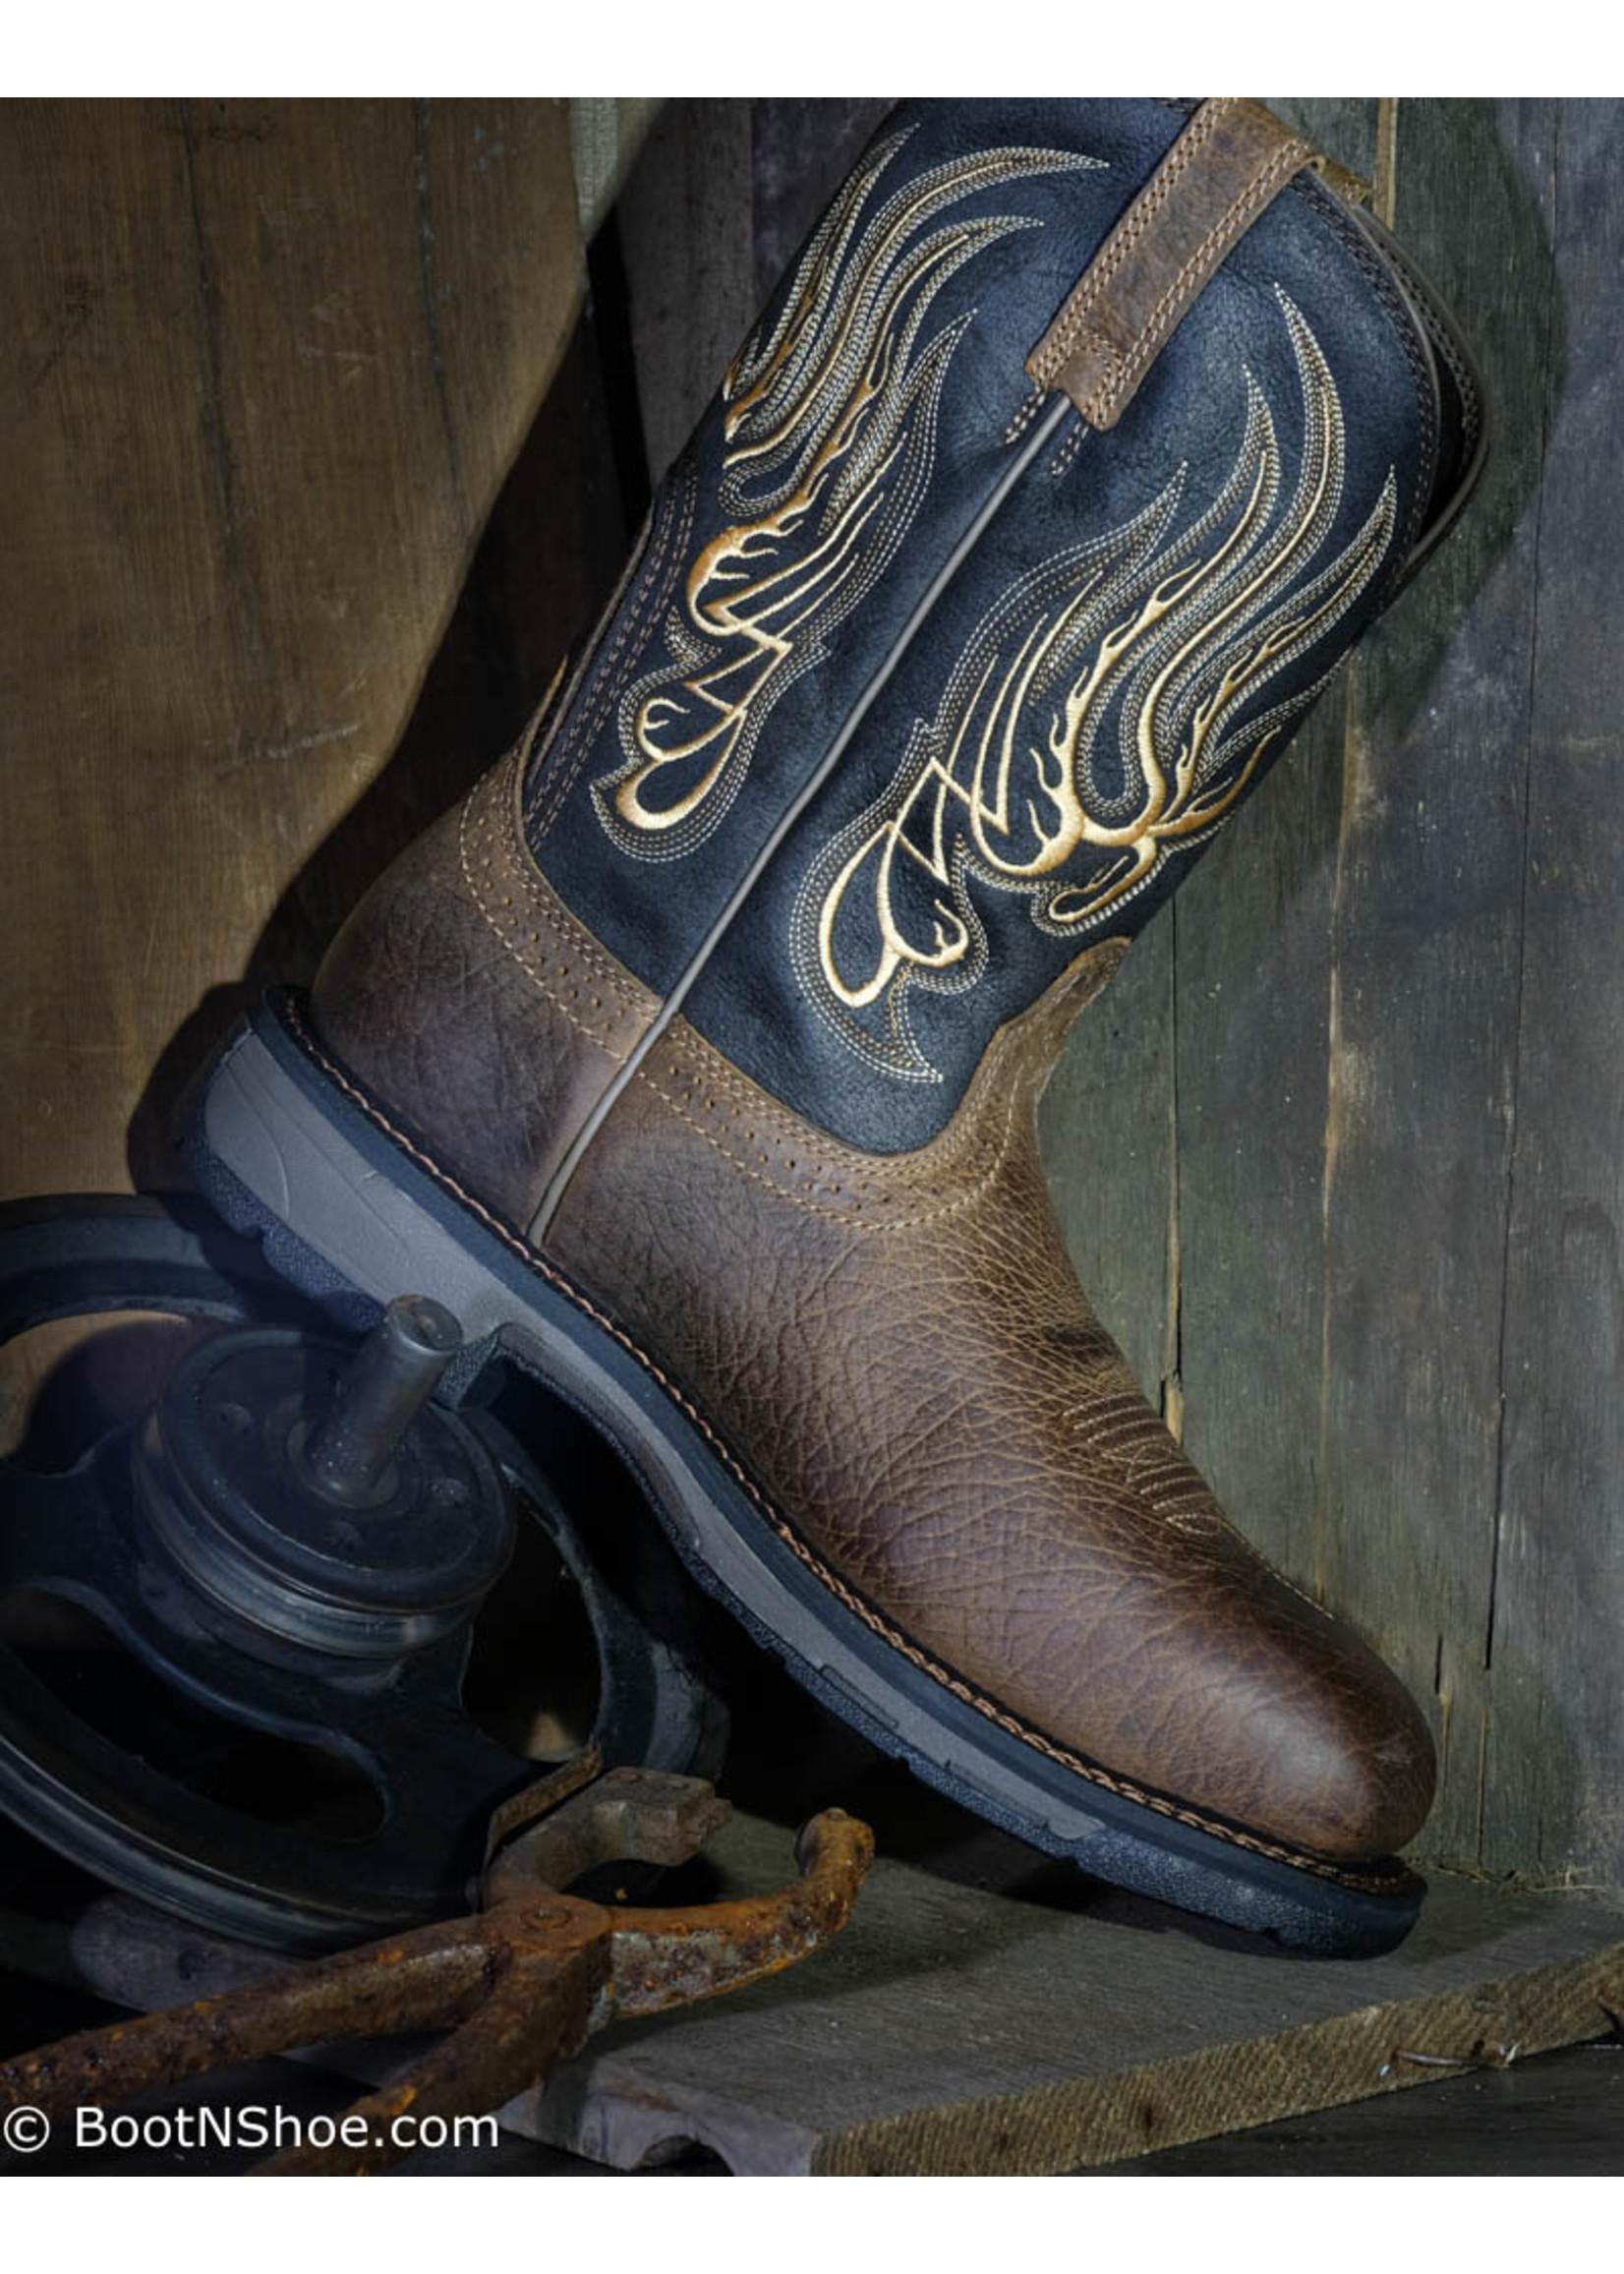 Ariat Workhog Mesteno Safety Composite Toe Work Boots 10010892